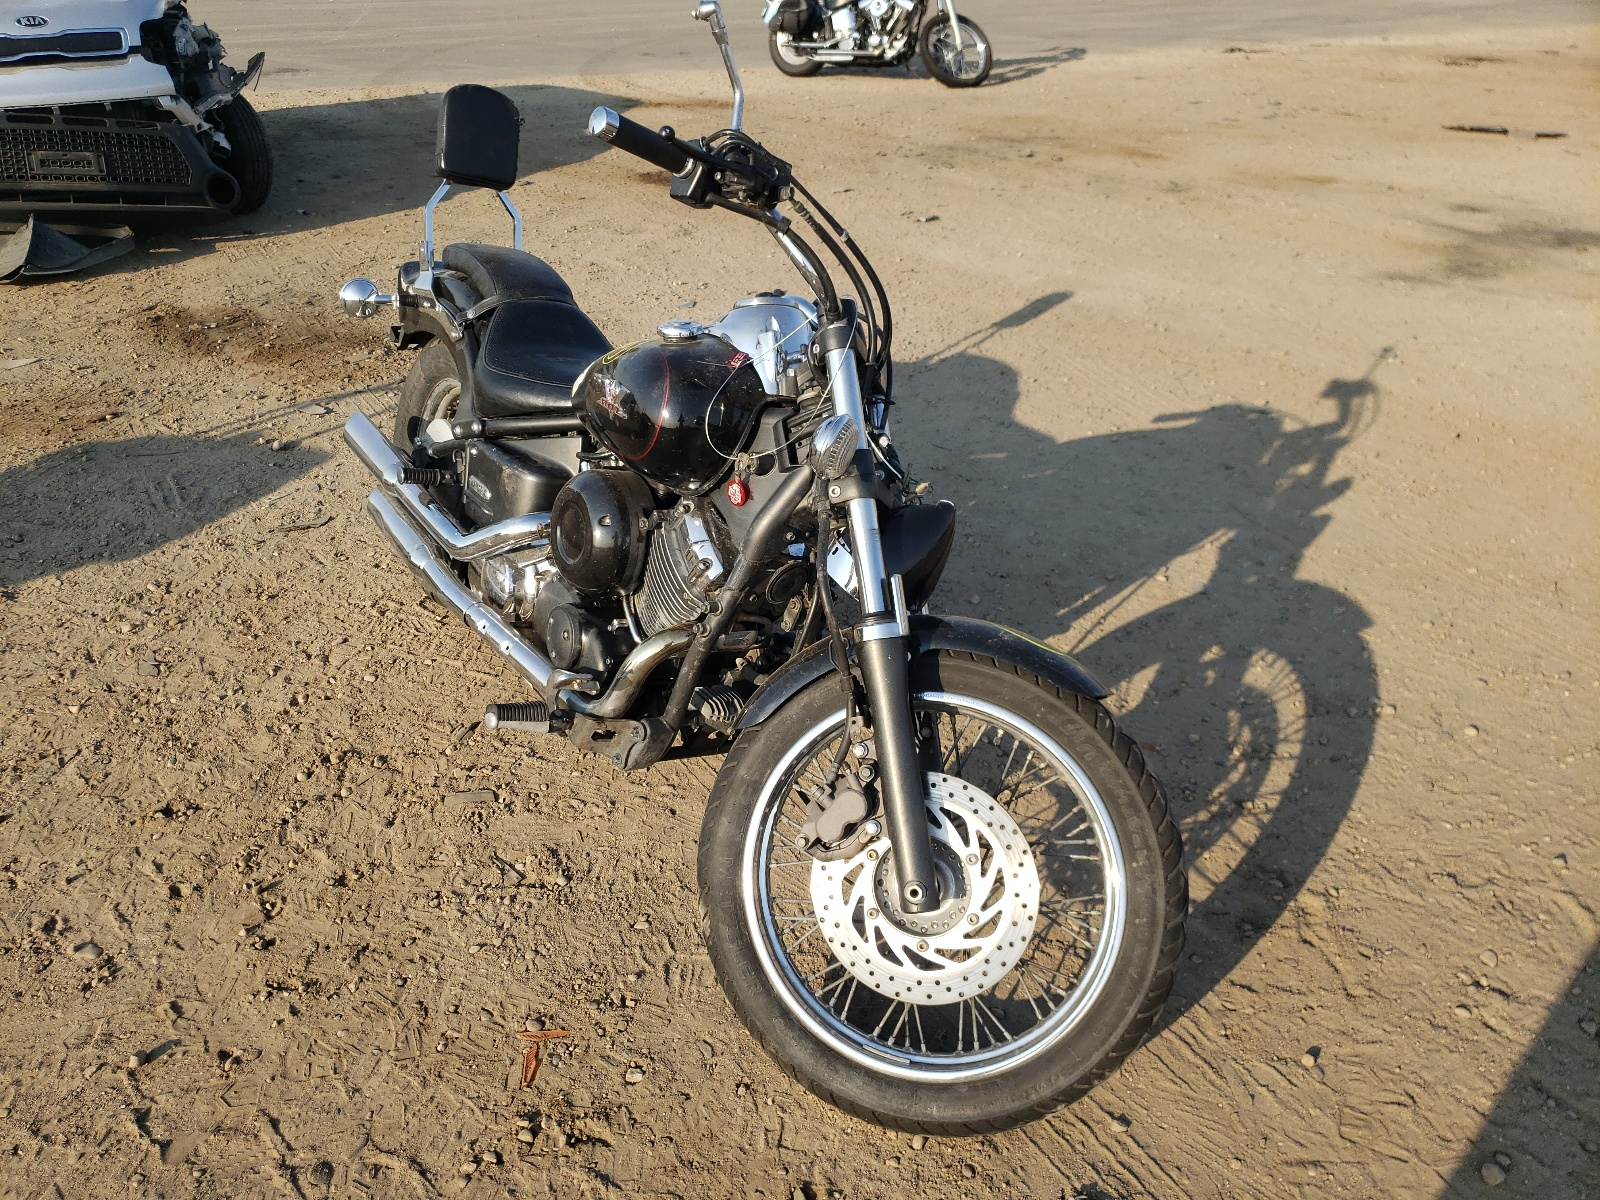 2005 Yamaha XVS65 Base